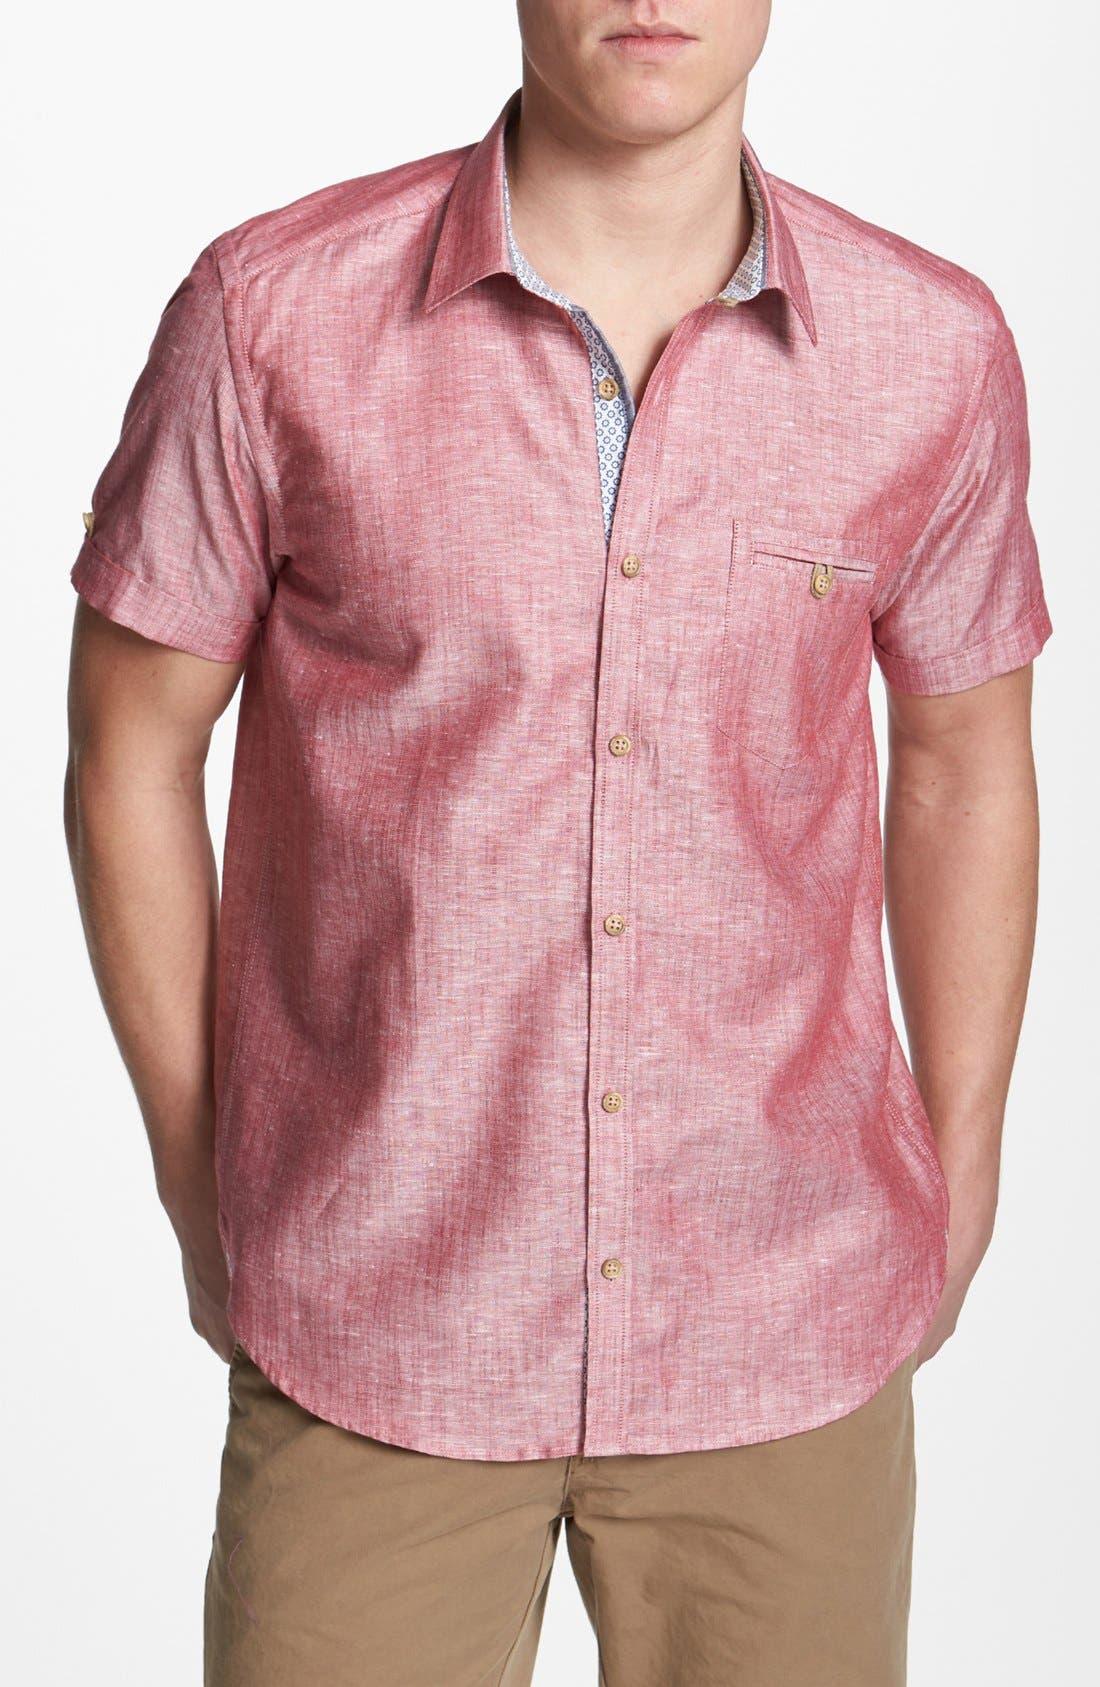 Main Image - Ted Baker London 'Mytime' Linen Blend Campshirt